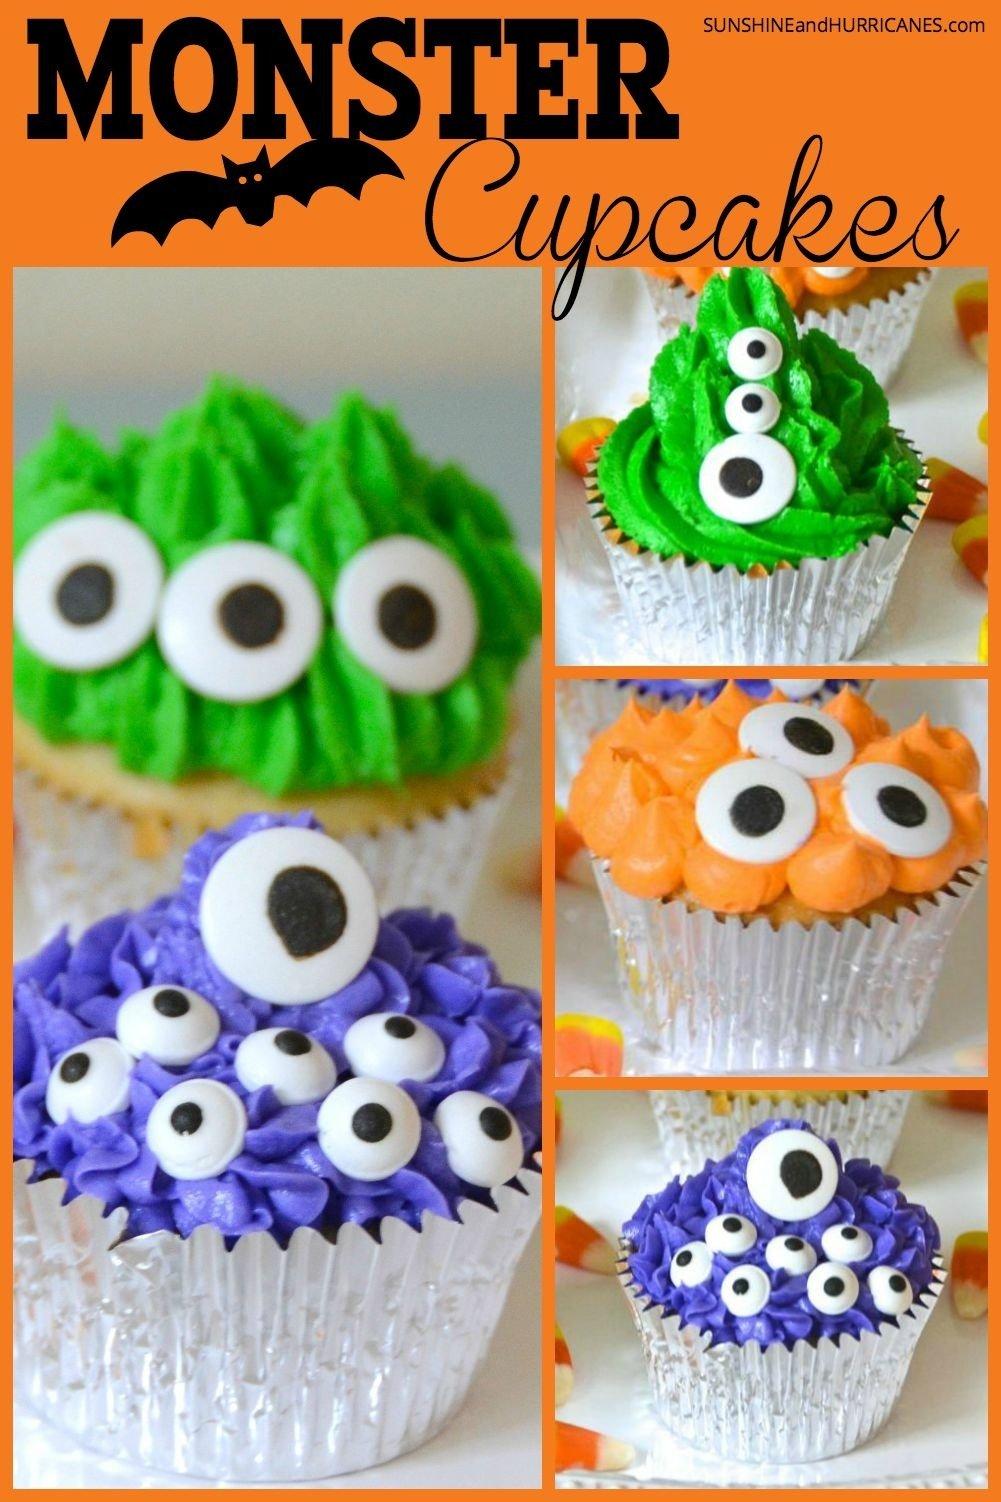 10 Best Halloween Cupcake Ideas For Kids monster halloween cupcakes 2020